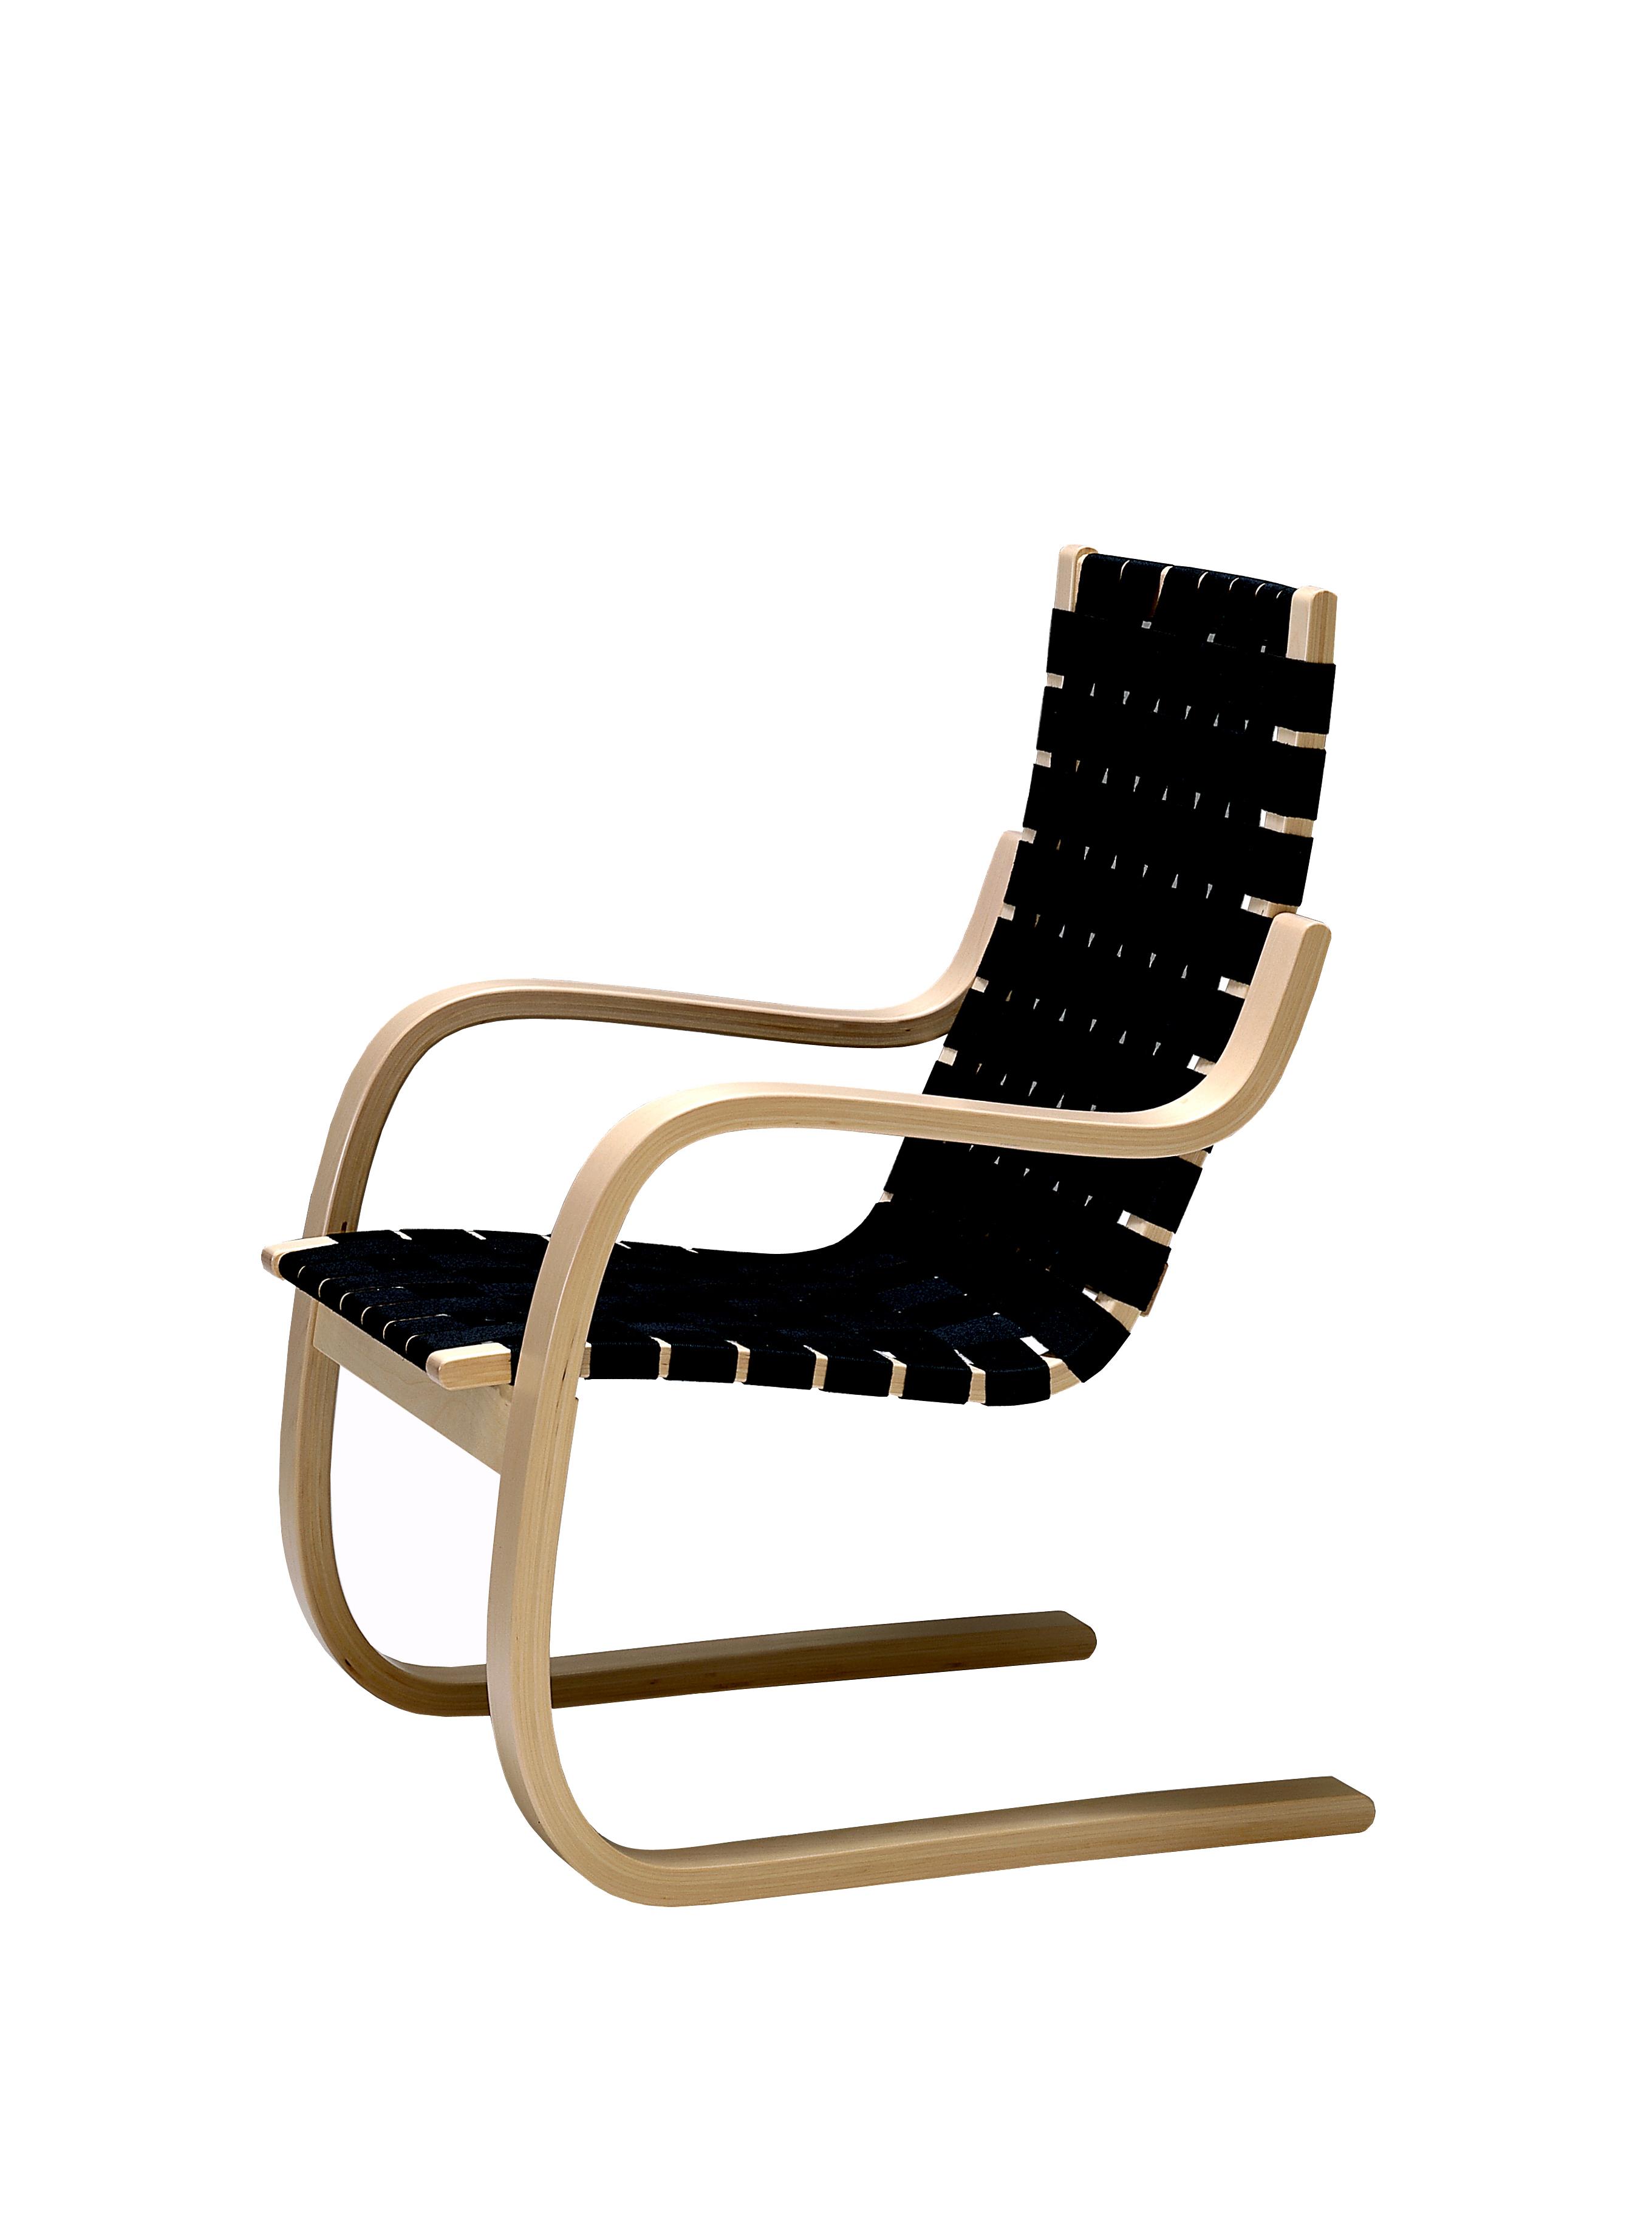 Artek – Armchair 406 – design Alvar Aalto, 1939